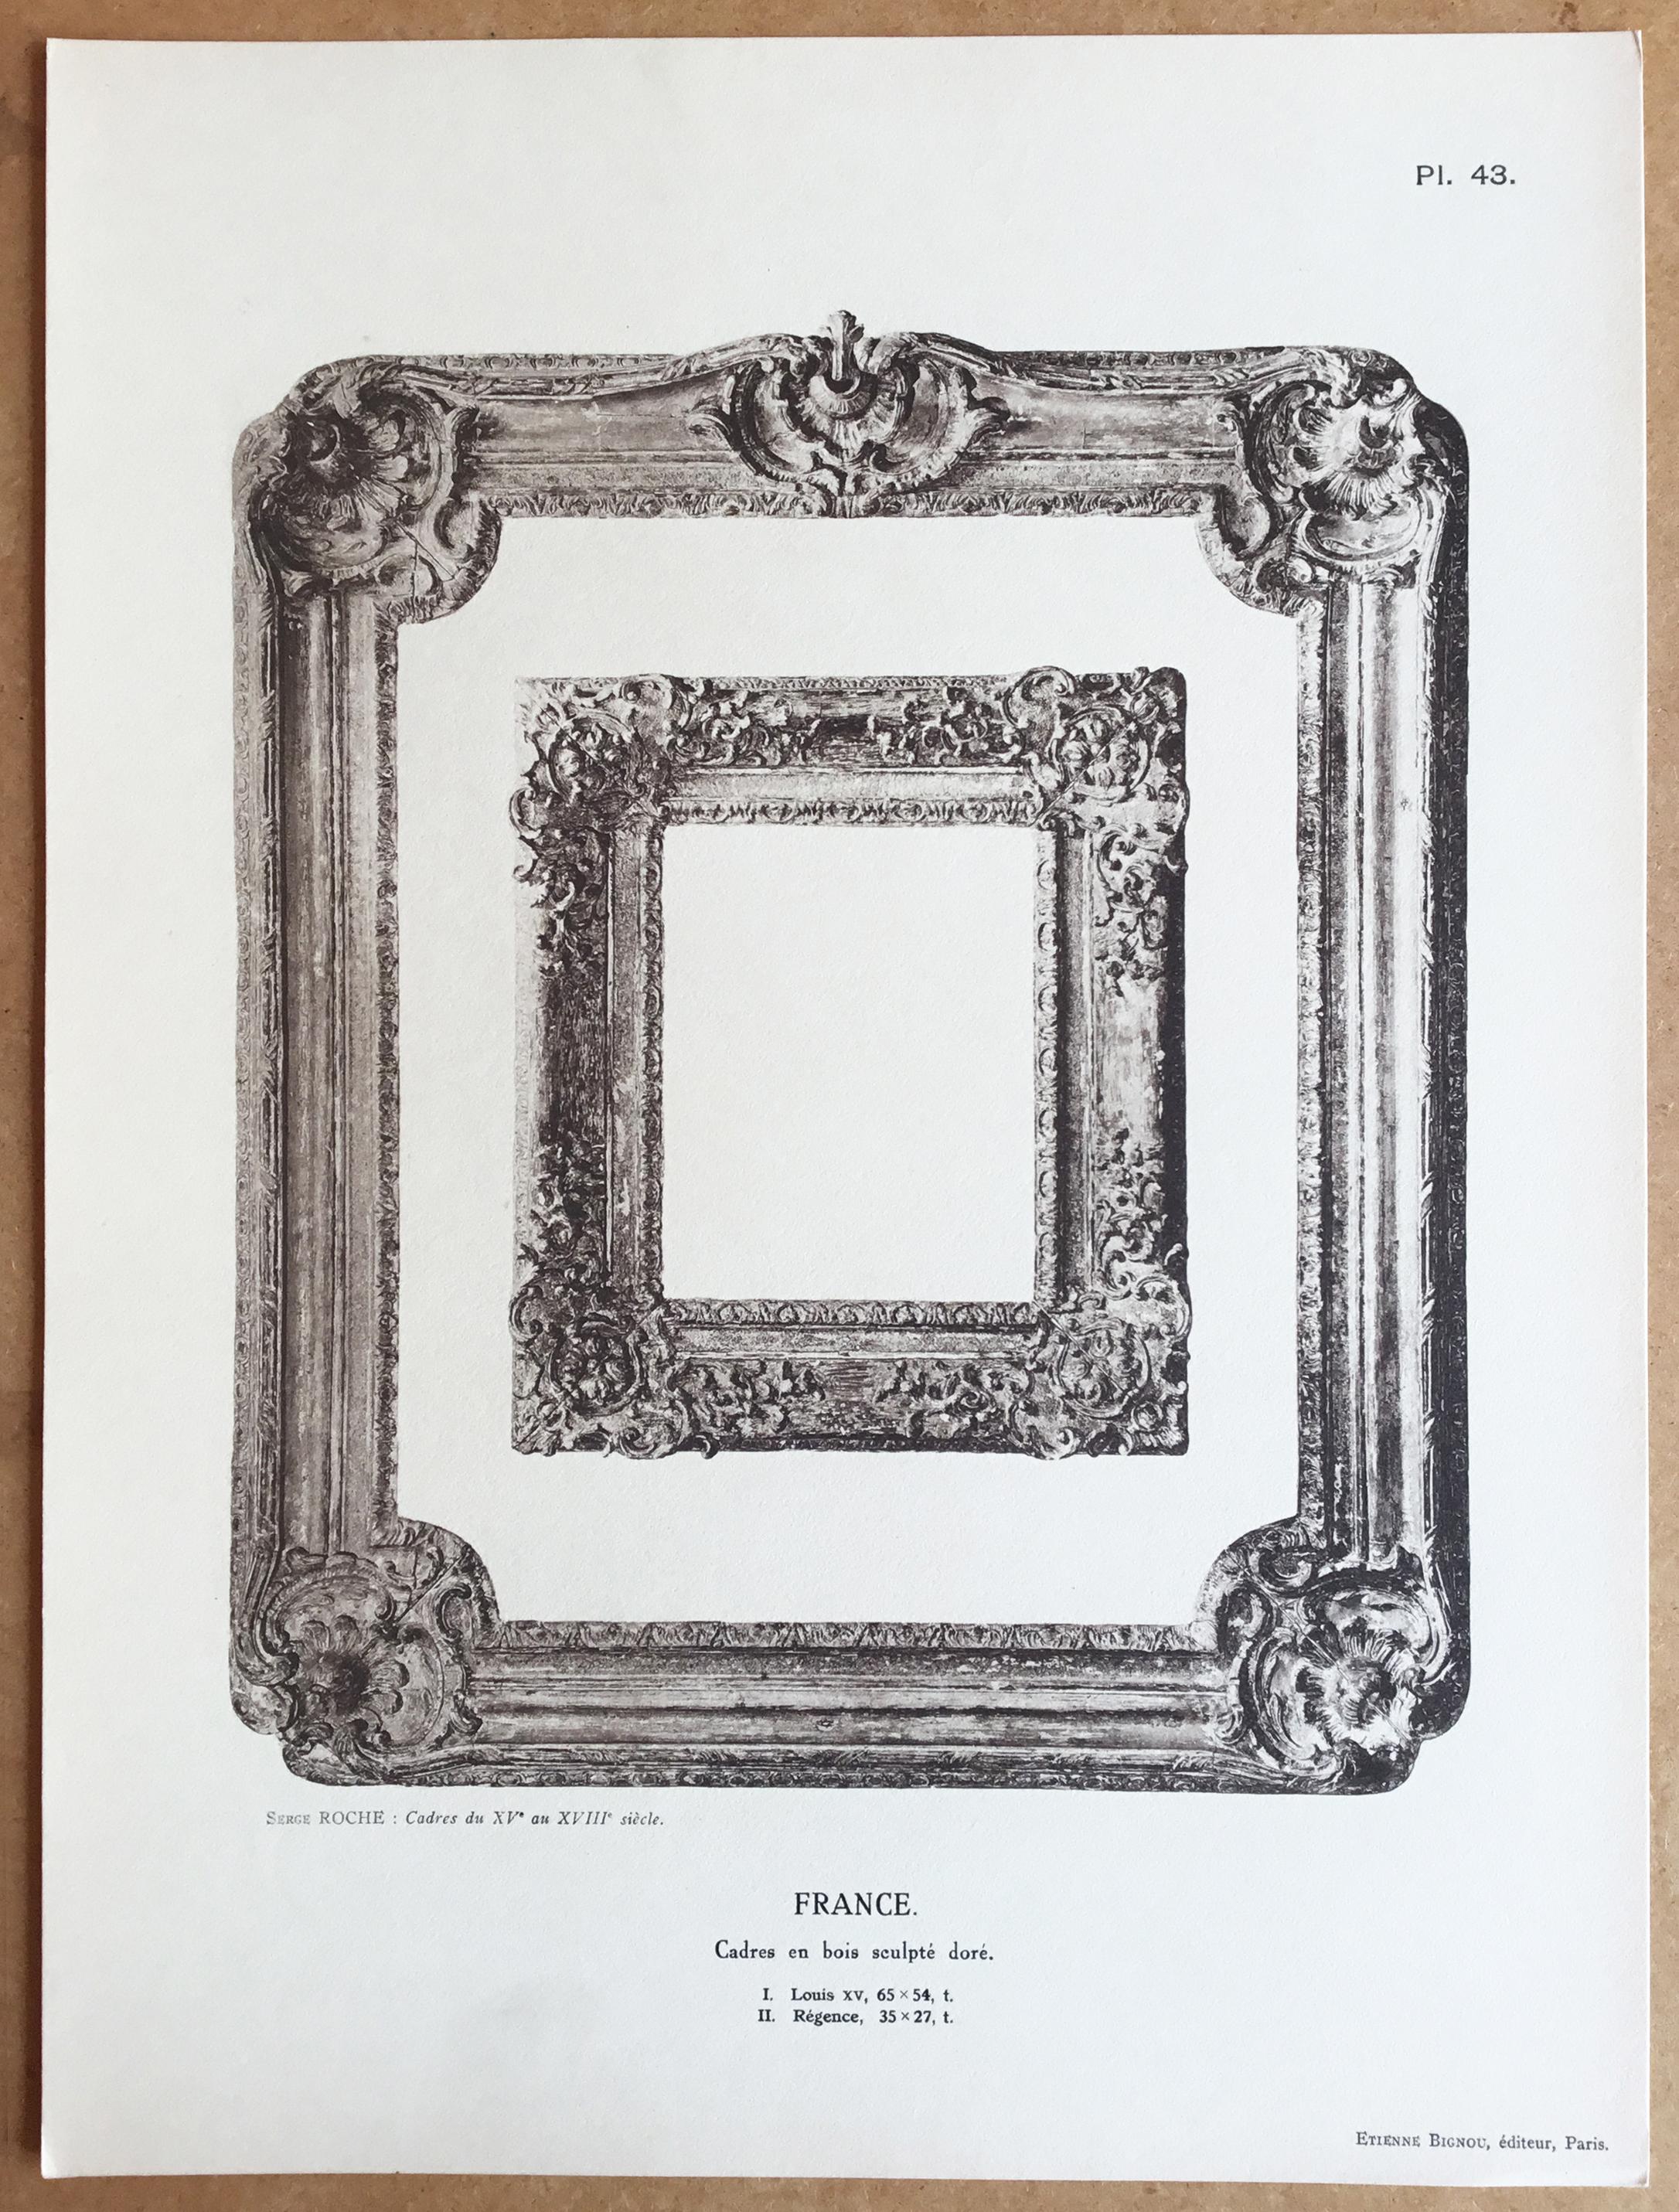 14 Plate 43